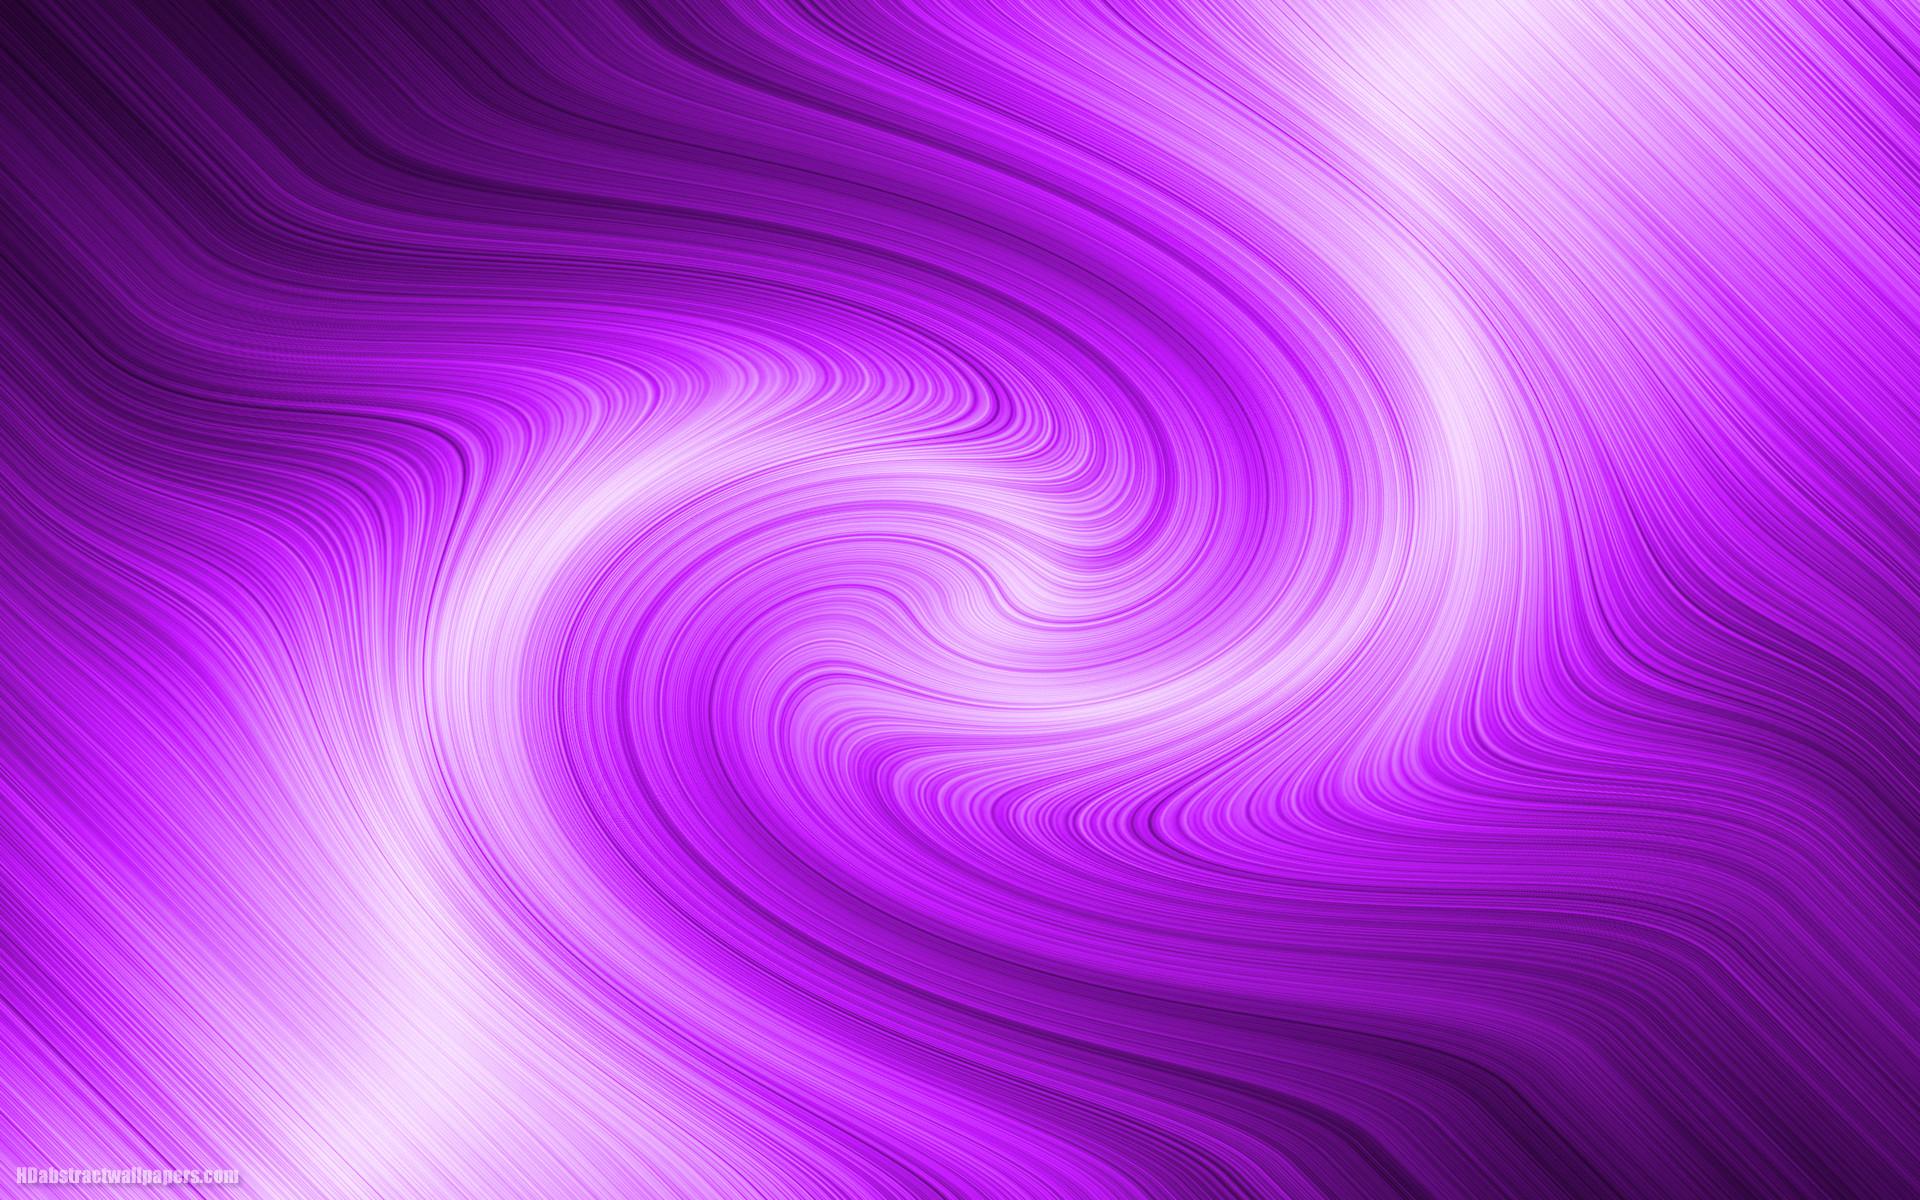 Purple Wallpapers 12 Best Wallpapers Collection Desktop: Luminous Backgrounds (45+ Images